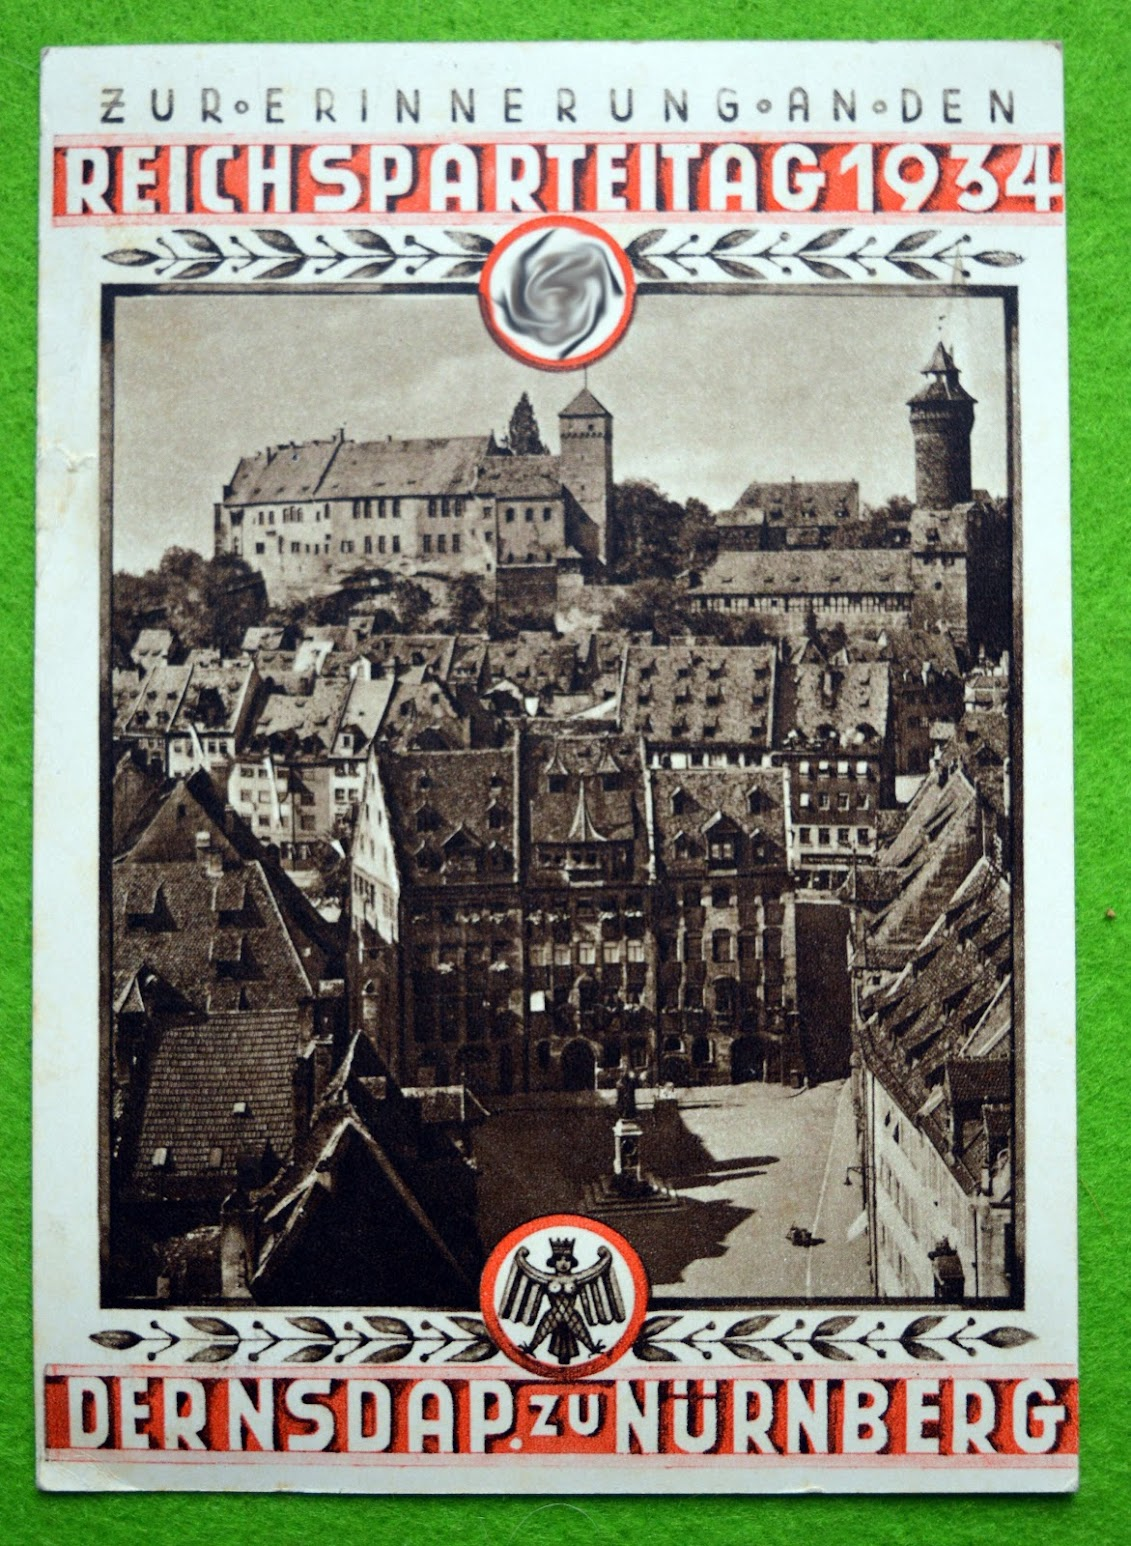 Karte vom Reichsparteitag 1934, Nürnberg